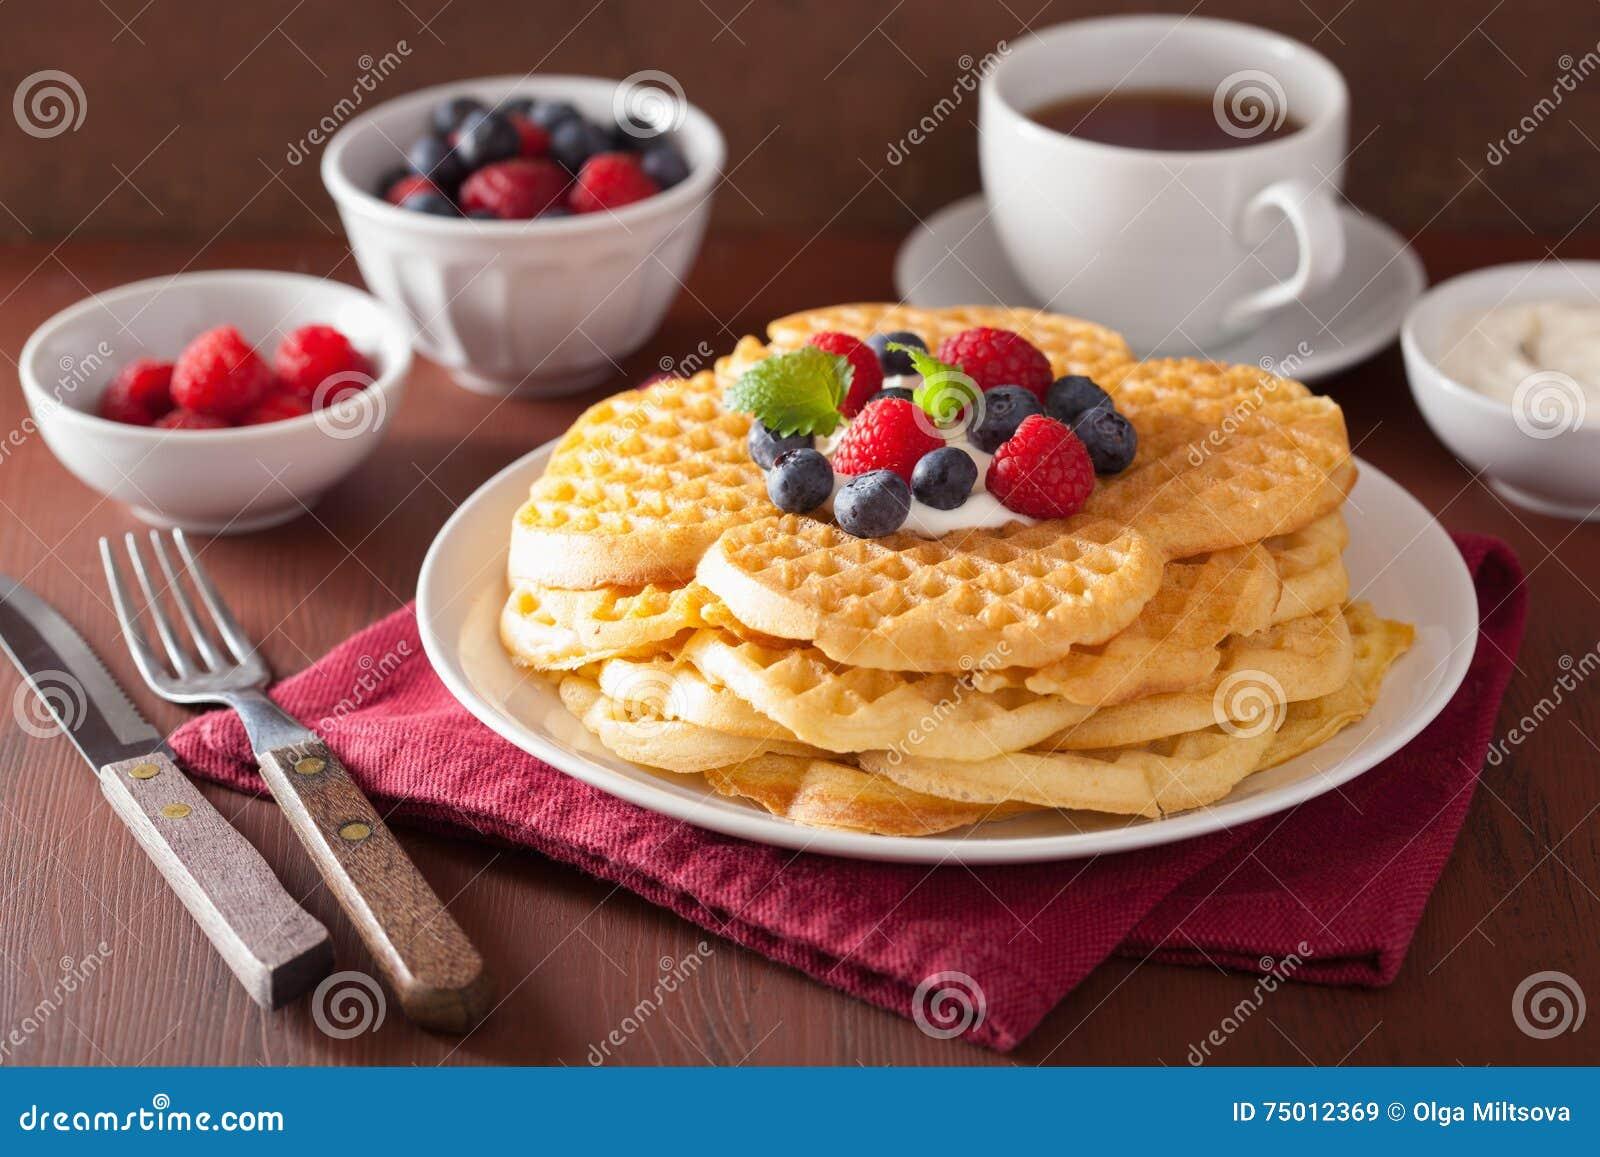 Waffles с fraiche и ягодами creme для завтрака